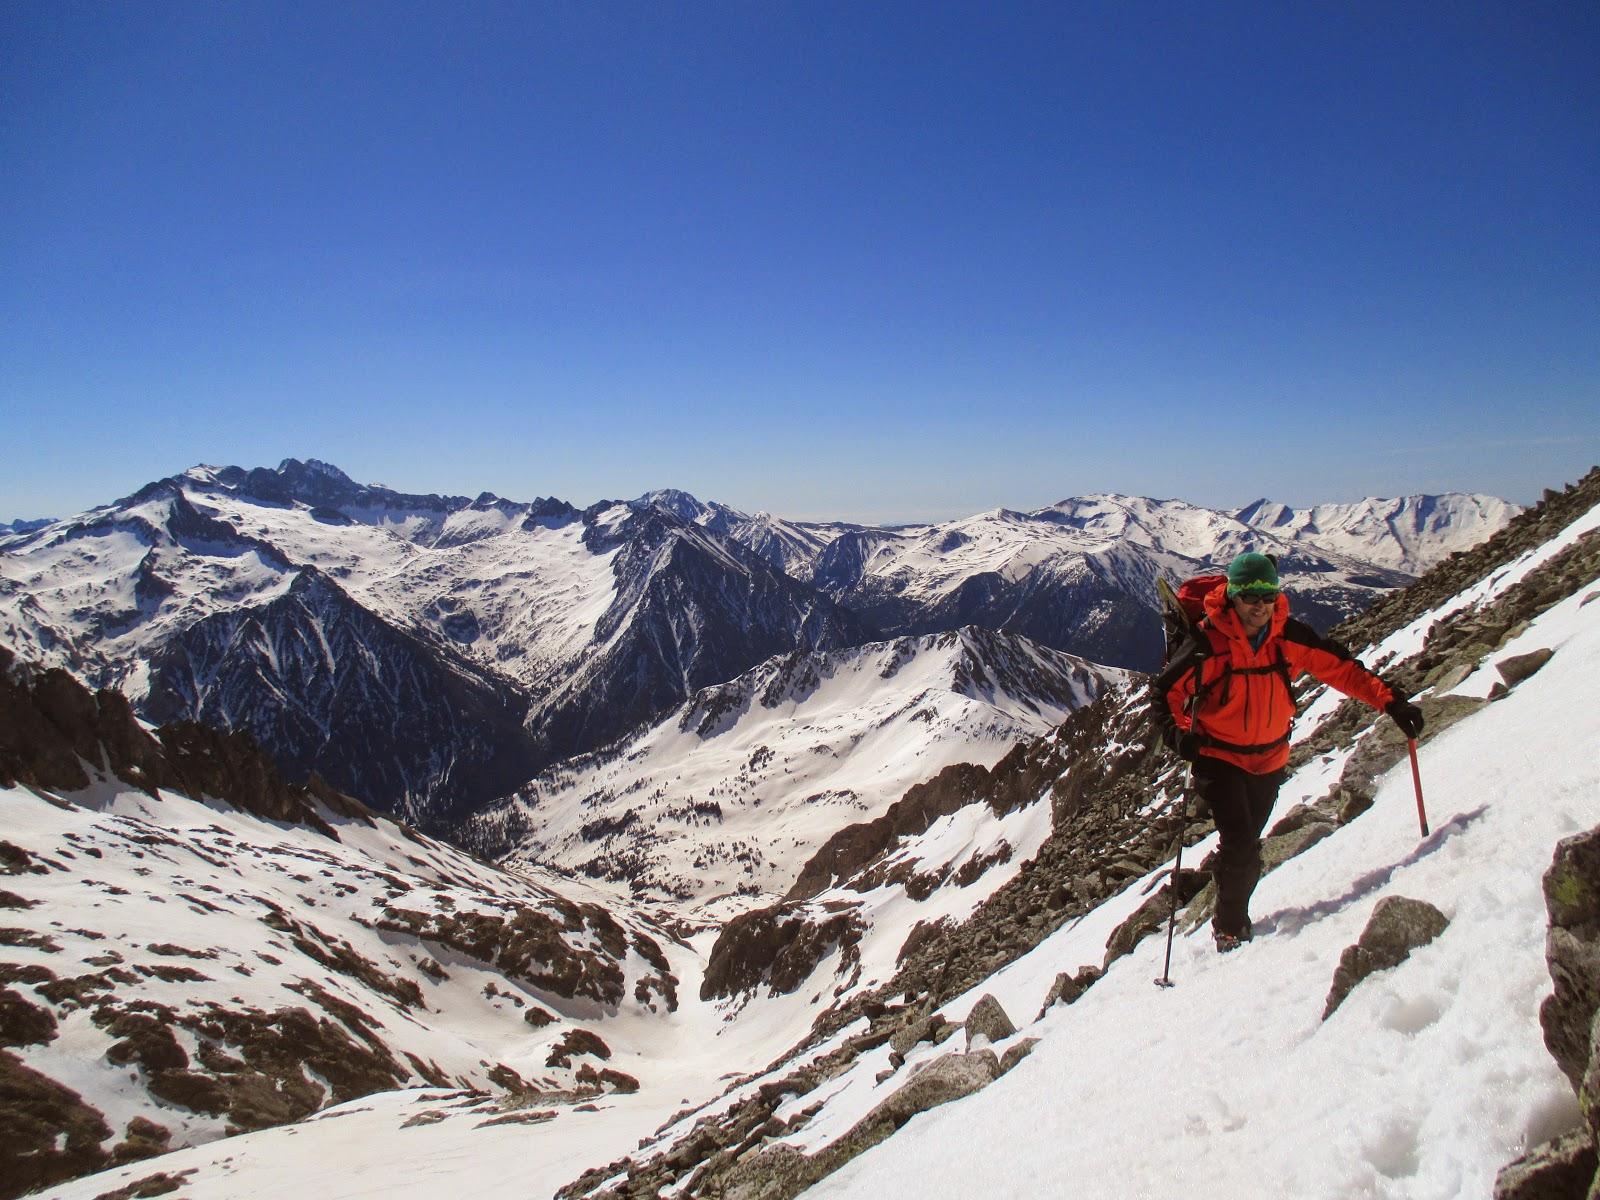 Valle de Literola-Pico Perdiguero-Valle de Remuñe